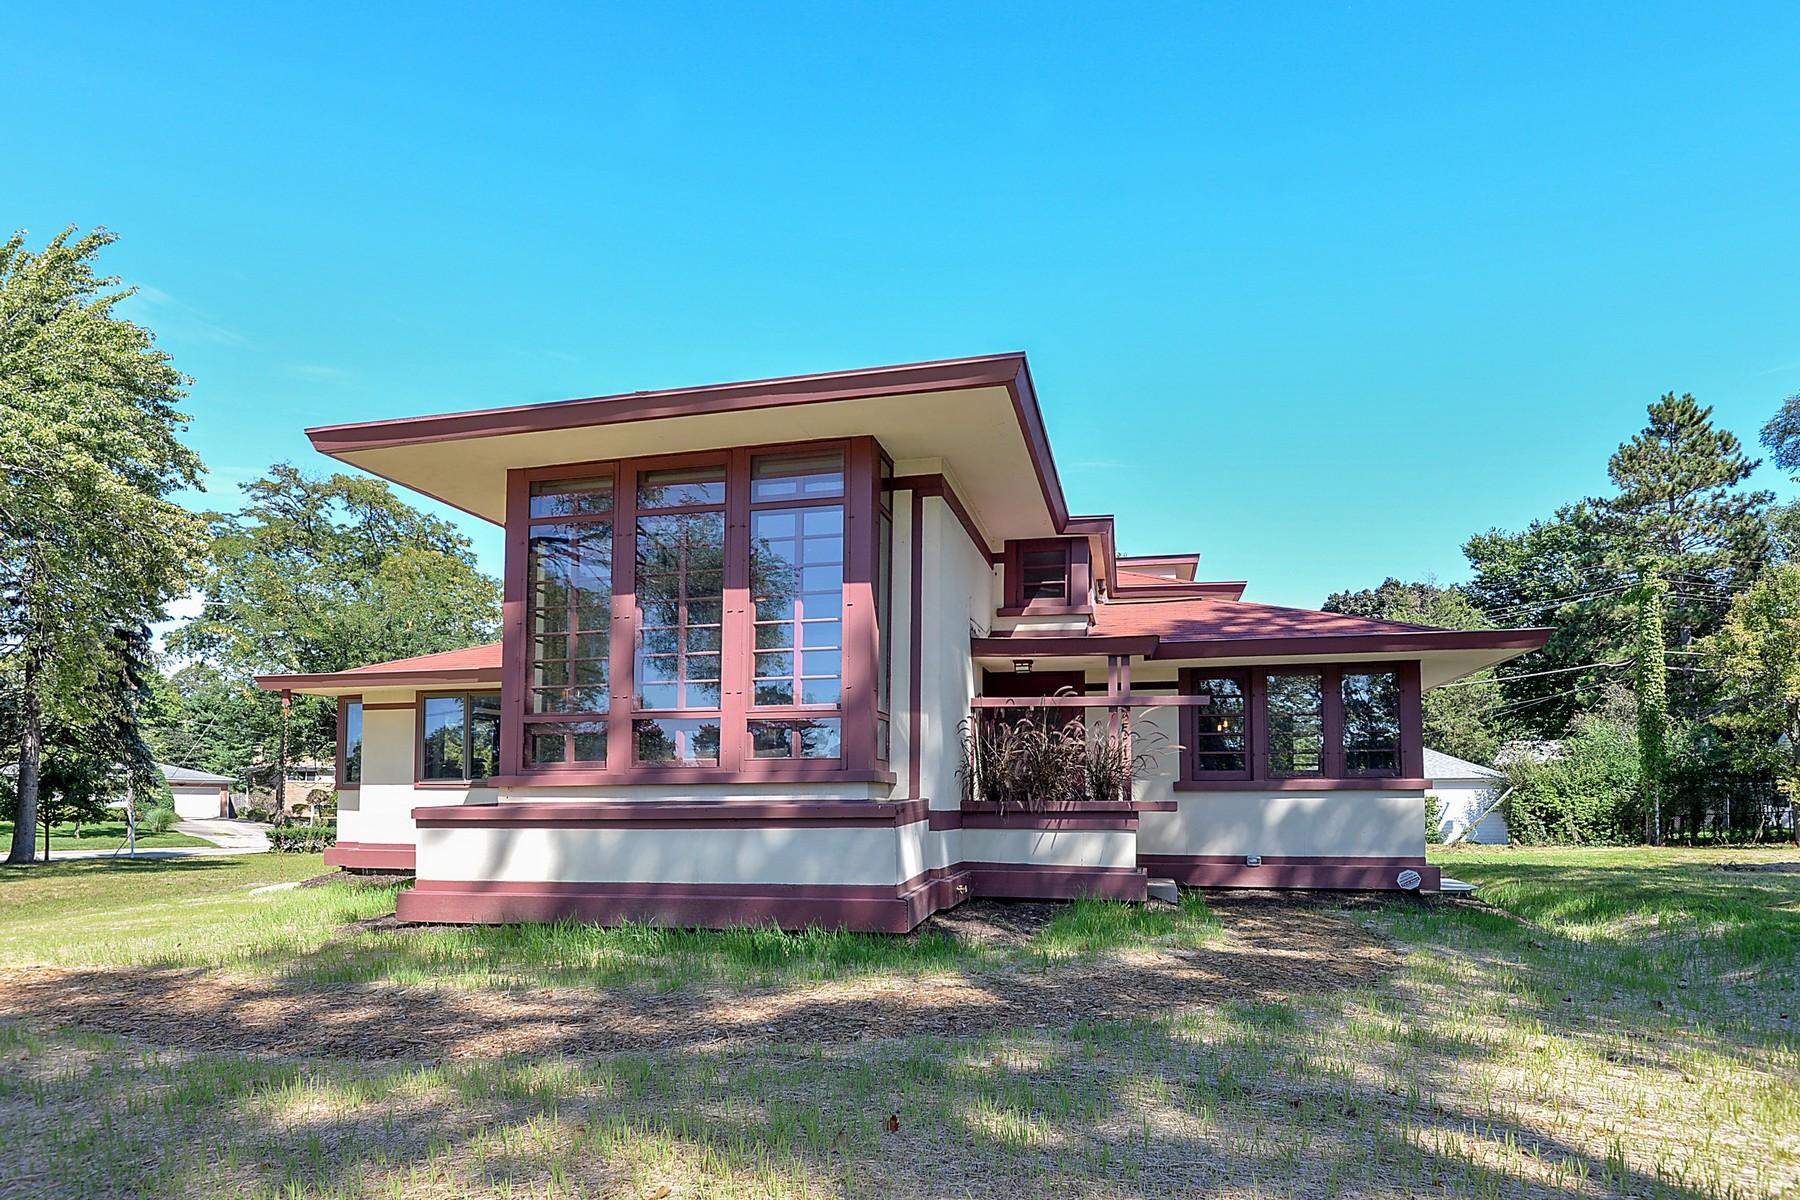 獨棟家庭住宅 為 出售 在 The House That Moved 2771 Crawford Avenue Evanston, 伊利諾斯州, 60201 美國